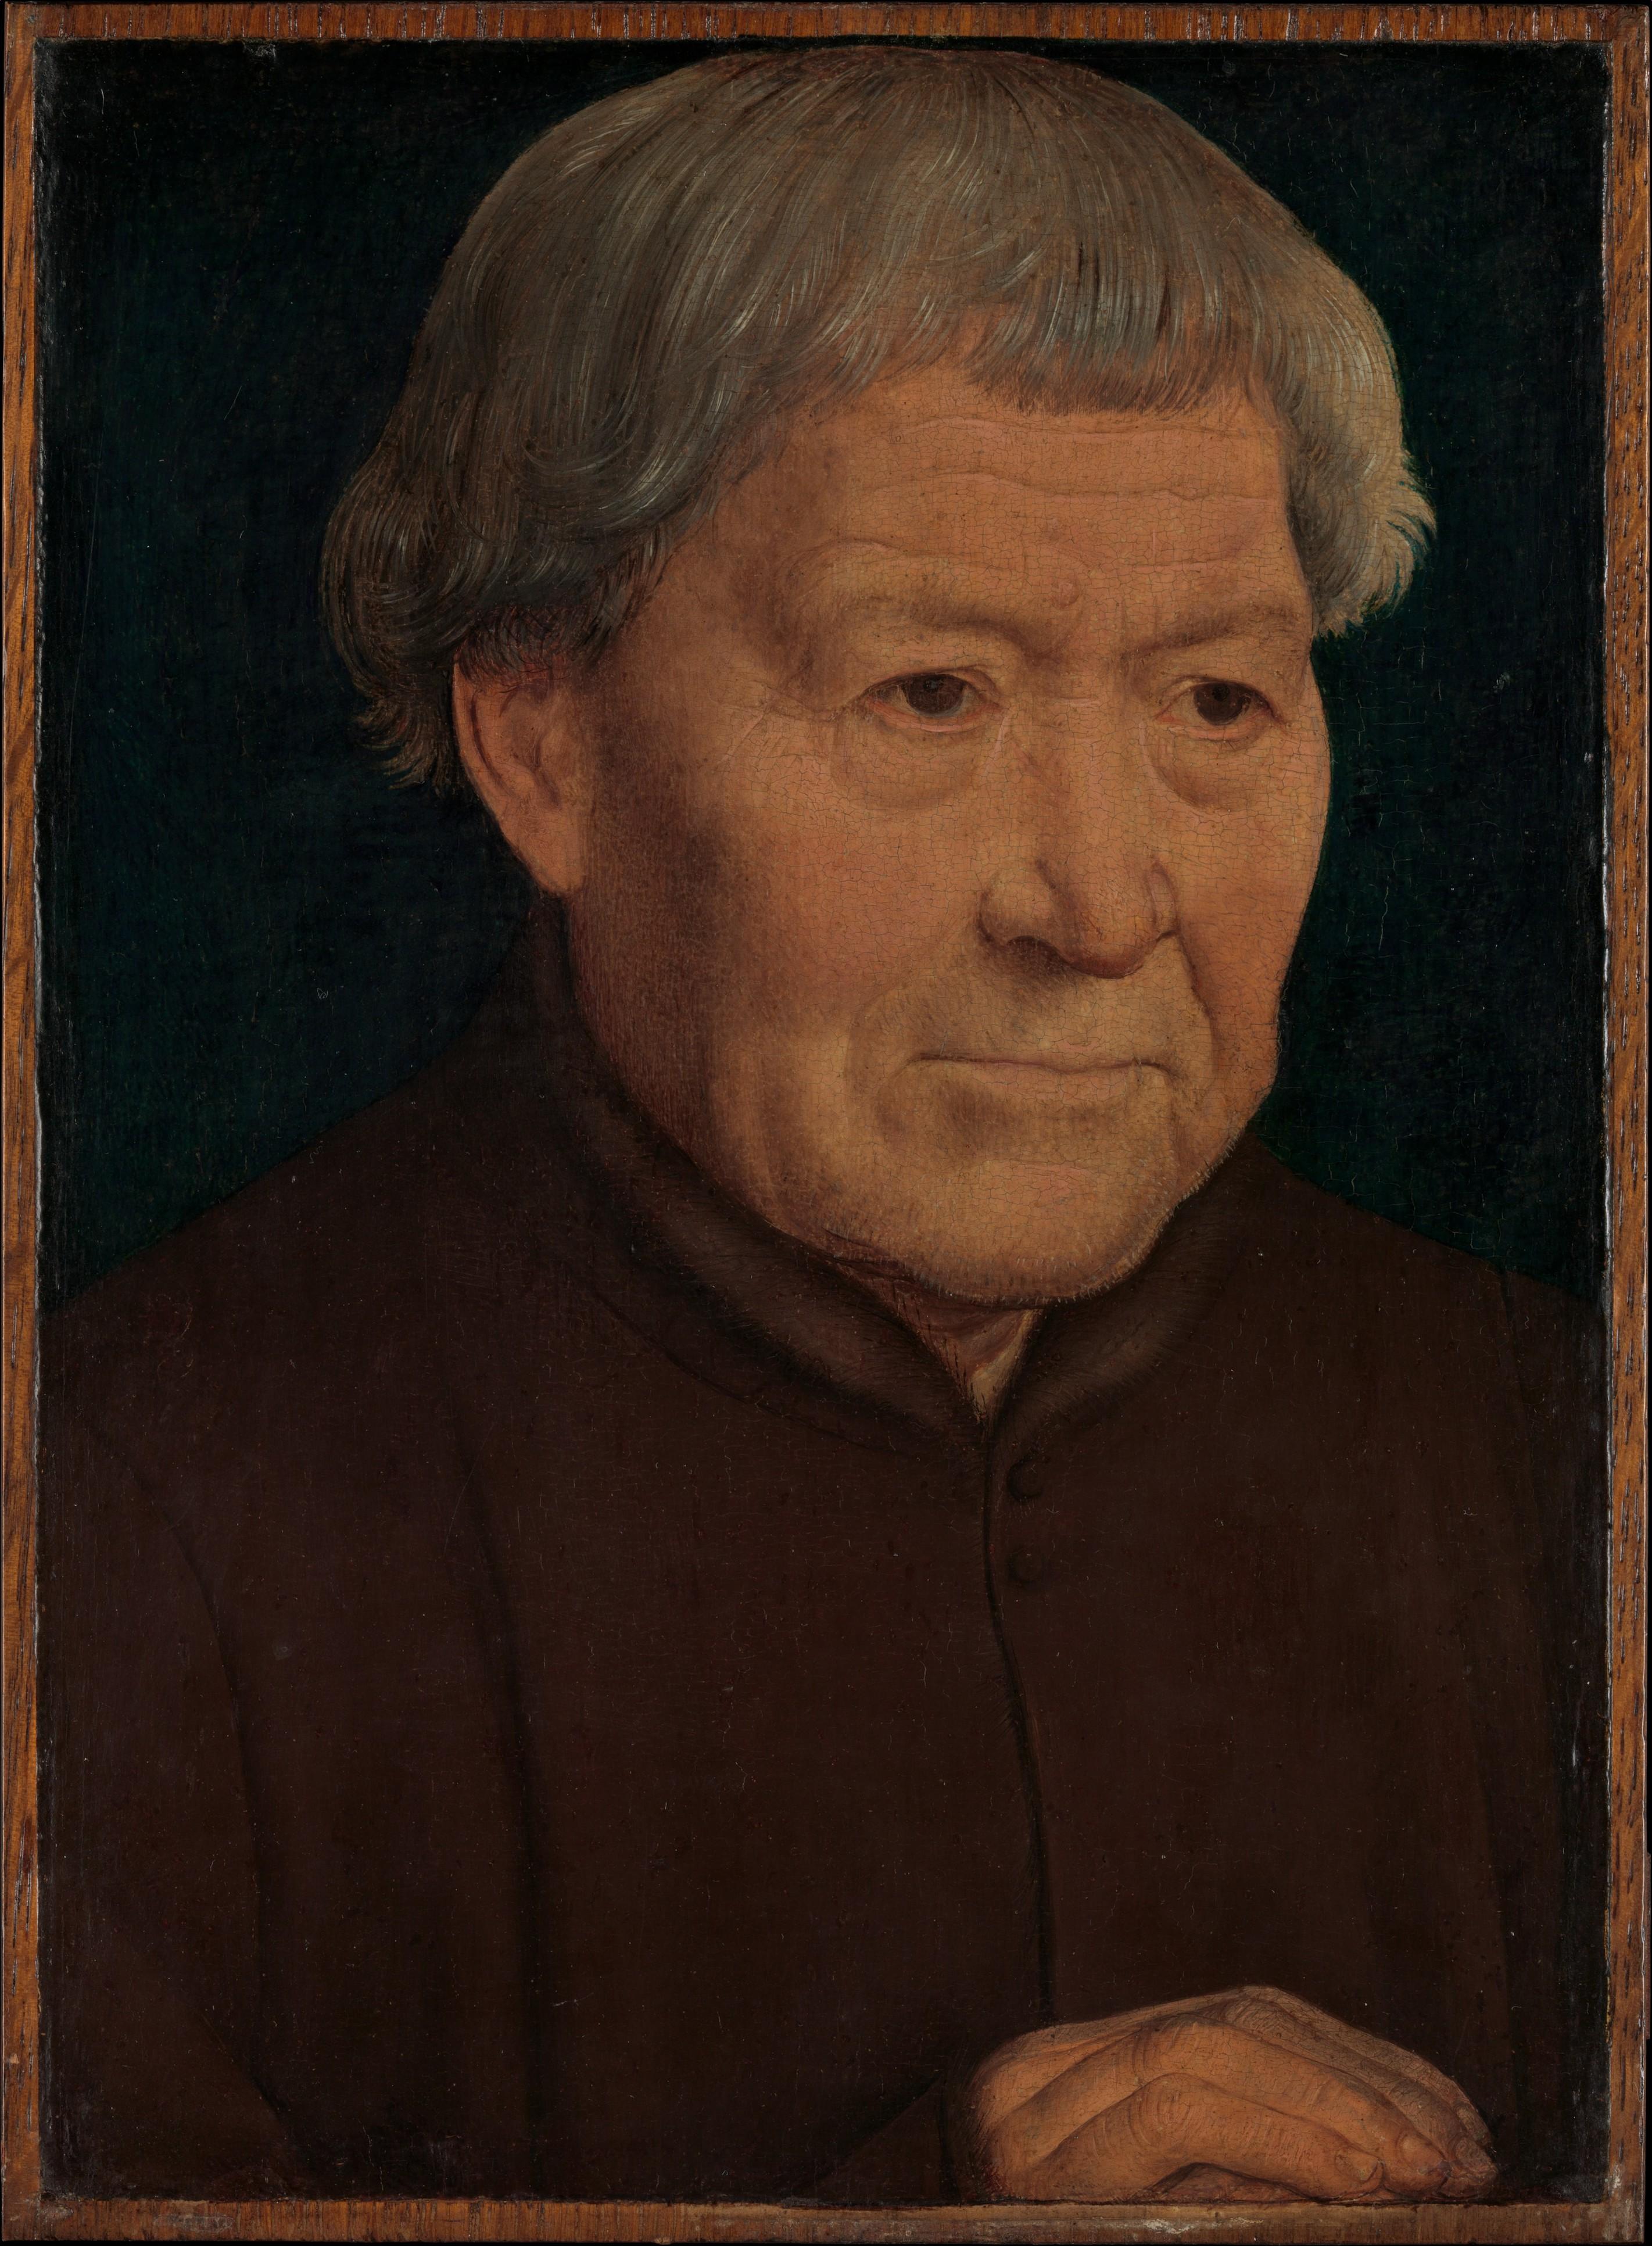 87562749f3ef Hans Memling | Portrait of an Old Man | The Met